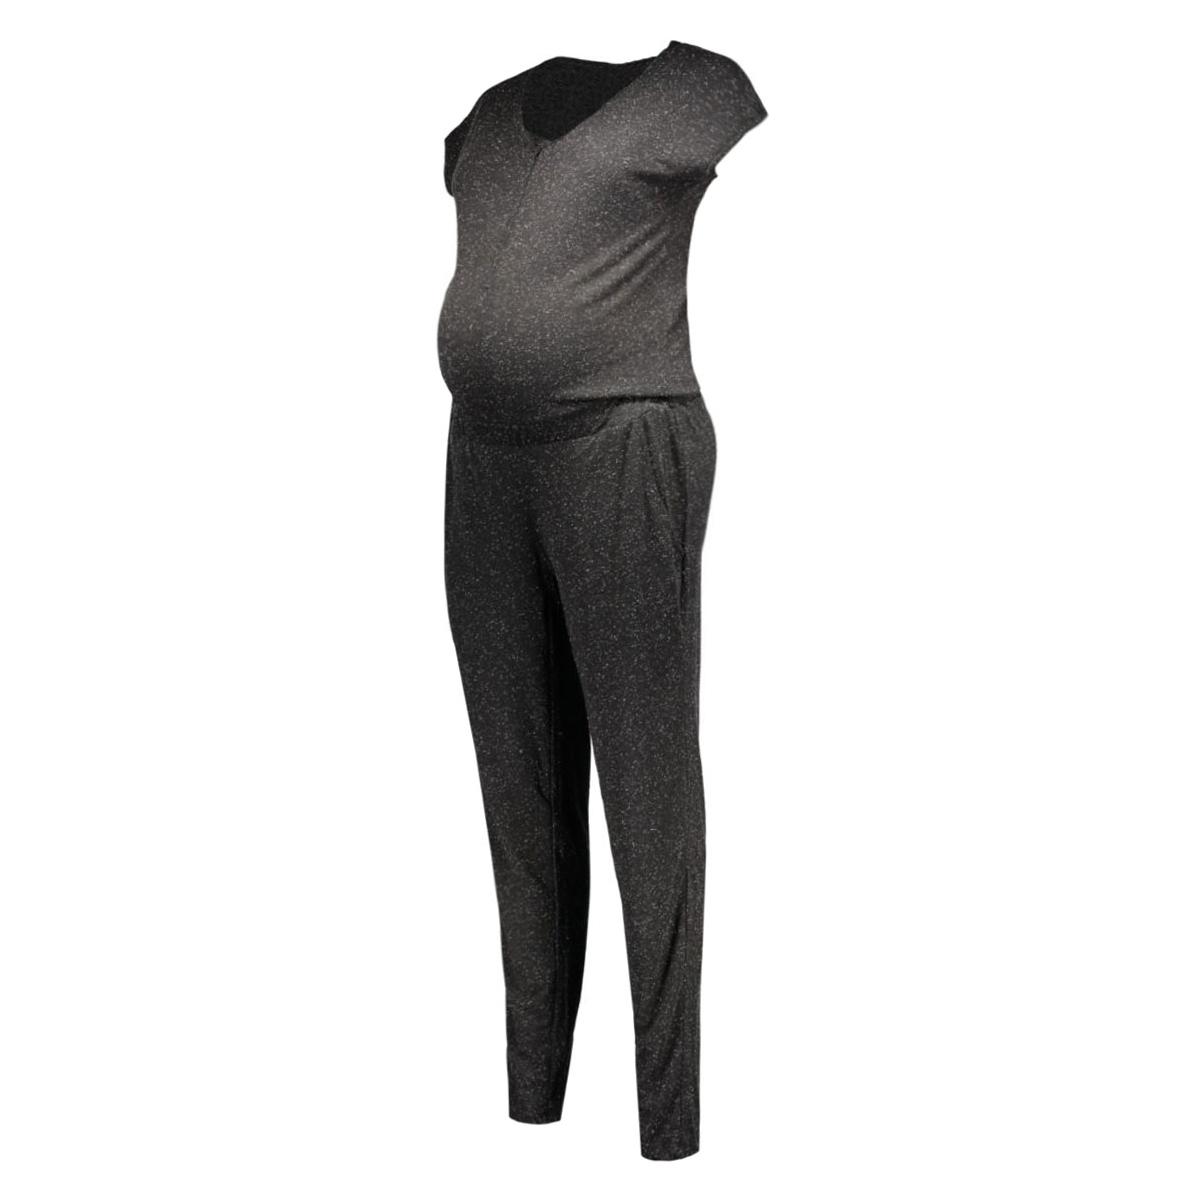 mlruby lia s/s jersey jumpsuit nf 20006805 mama-licious positie broek dark grey melange